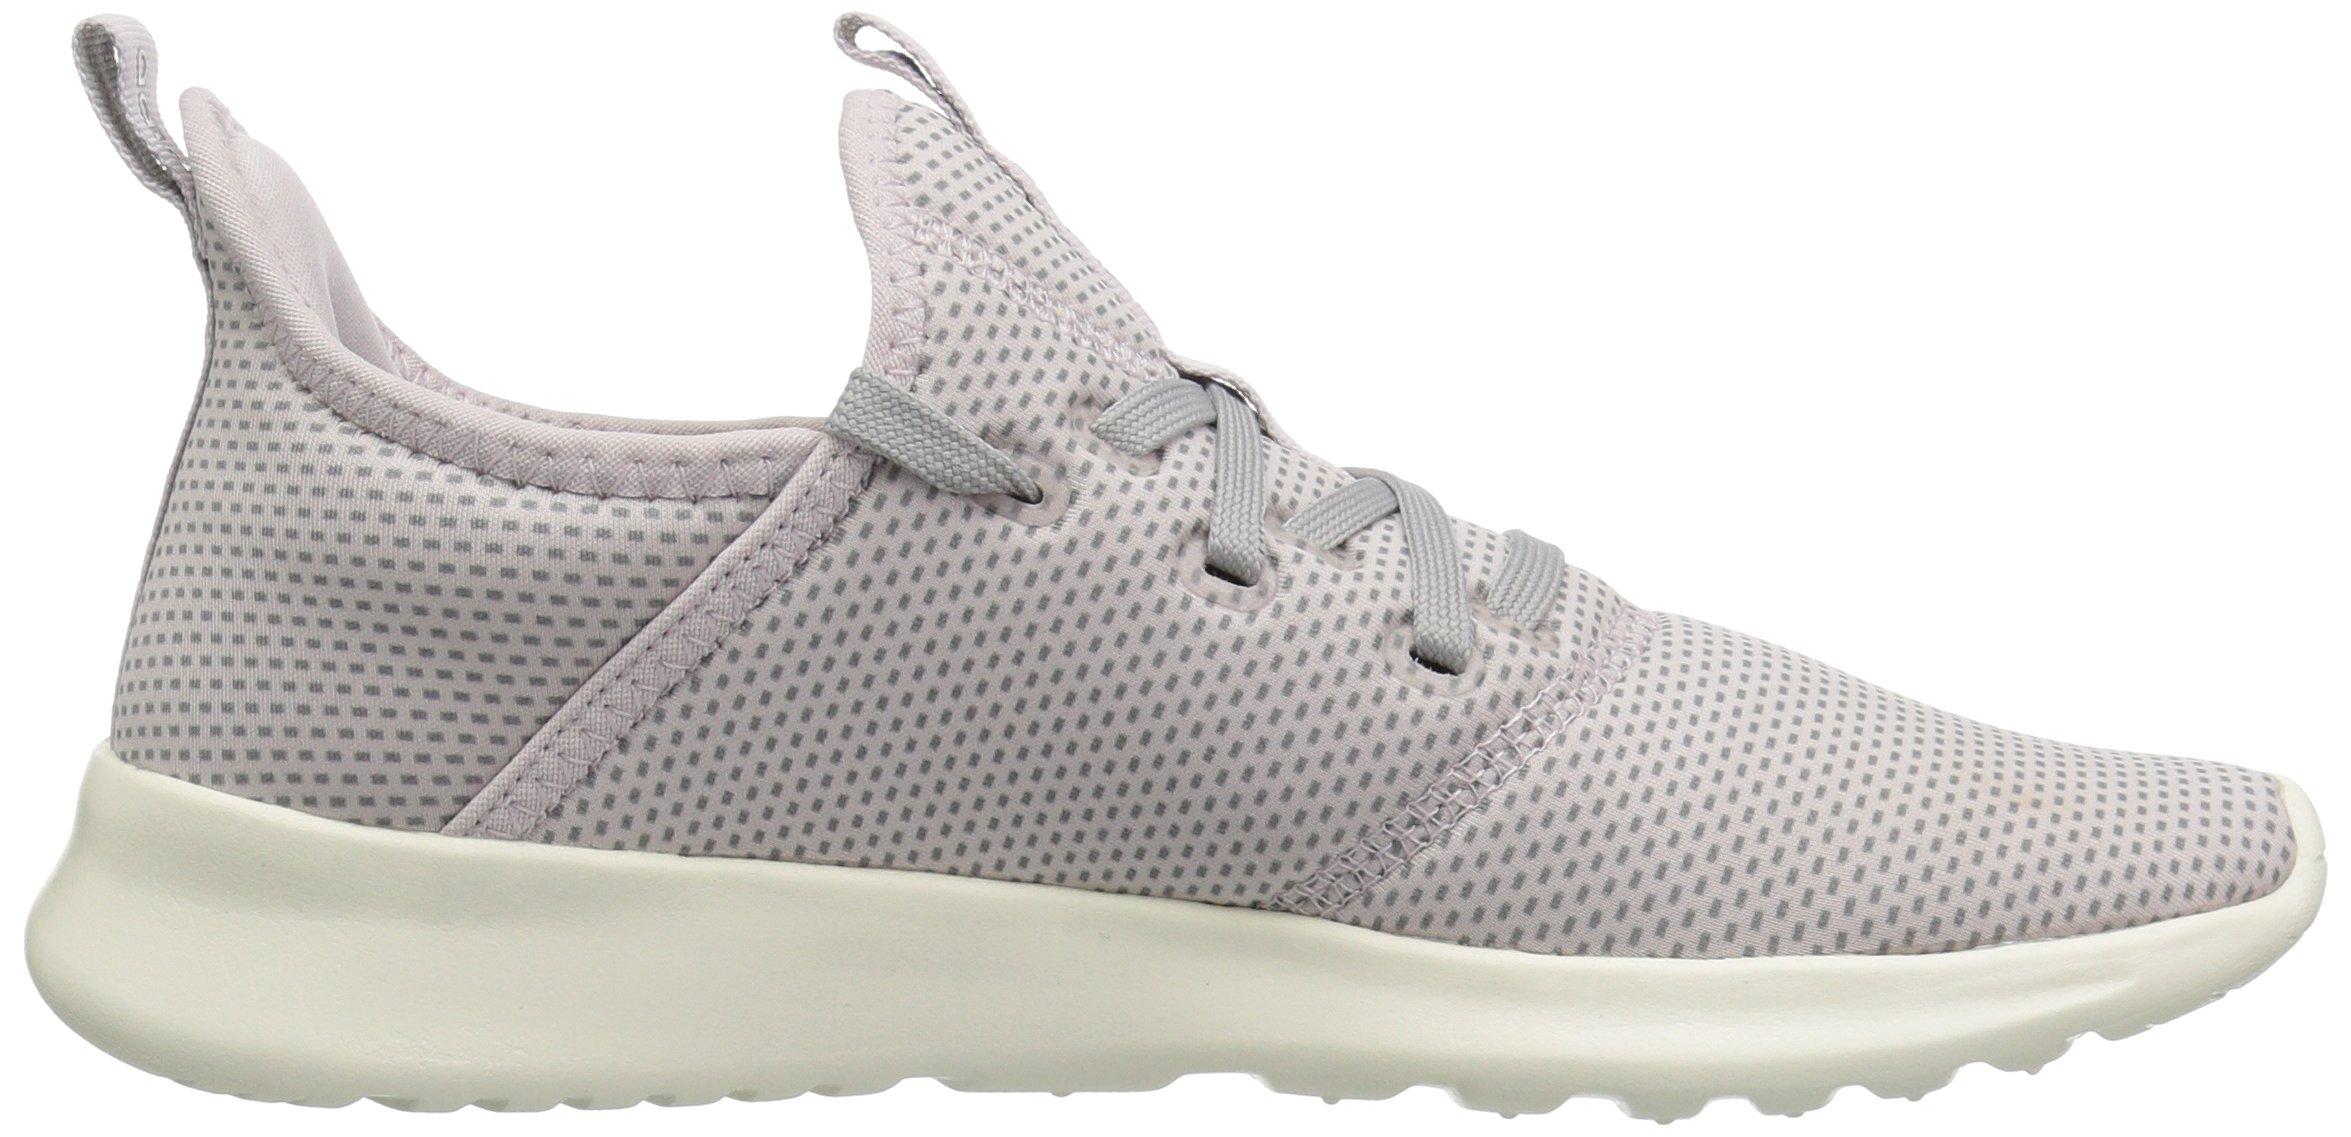 adidas Performance Women's Cloudfoam Pure Running Shoe, Ice Purple/Grey/White, 5 M US by adidas (Image #6)